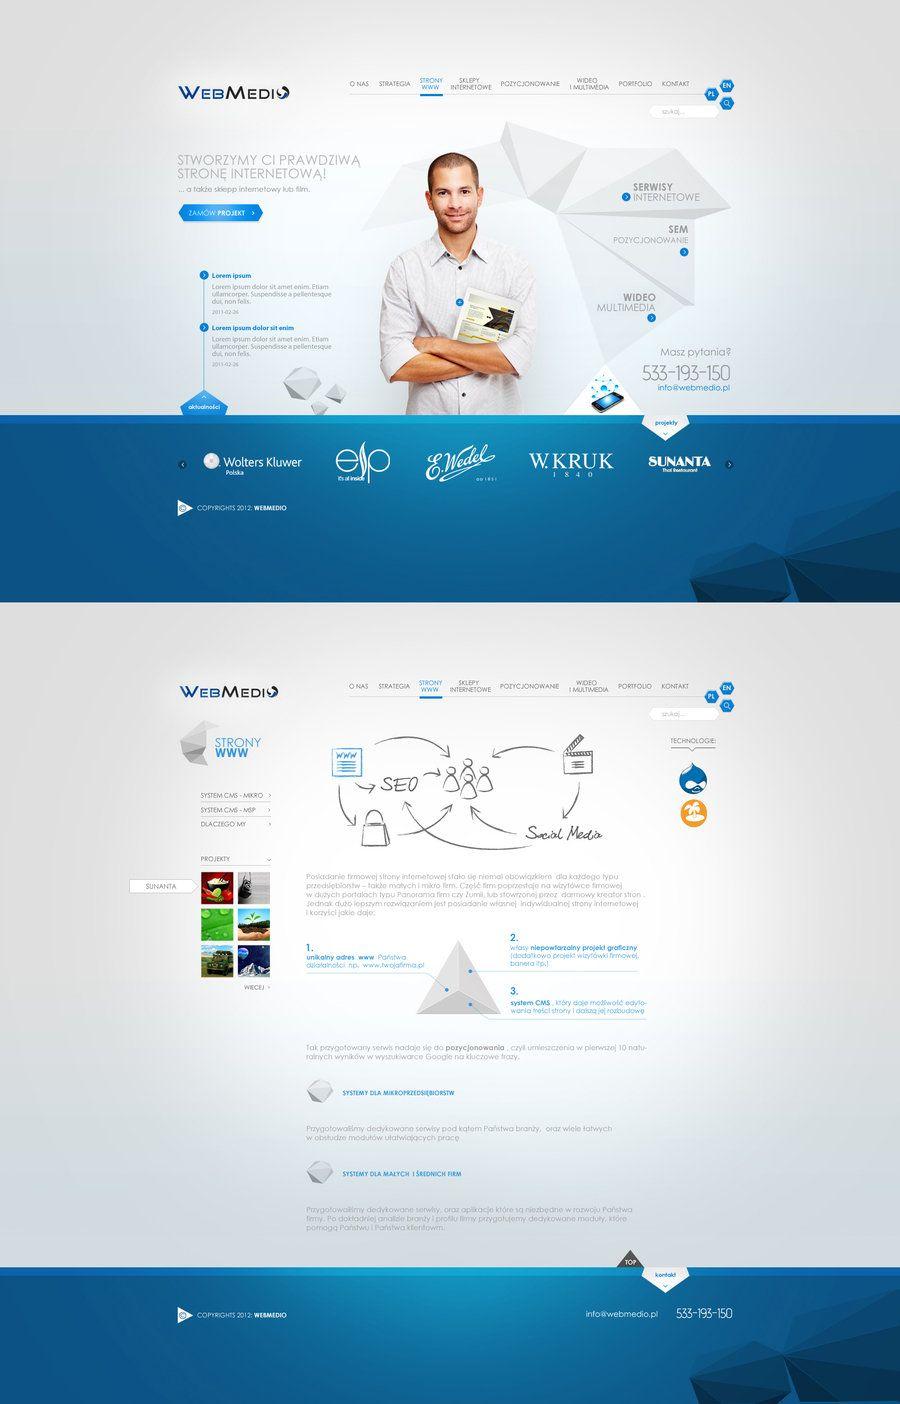 Webmedio 2 By Caduceus26 On Deviantart Wordpress Web Design Web Development Design Web Design Inspiration